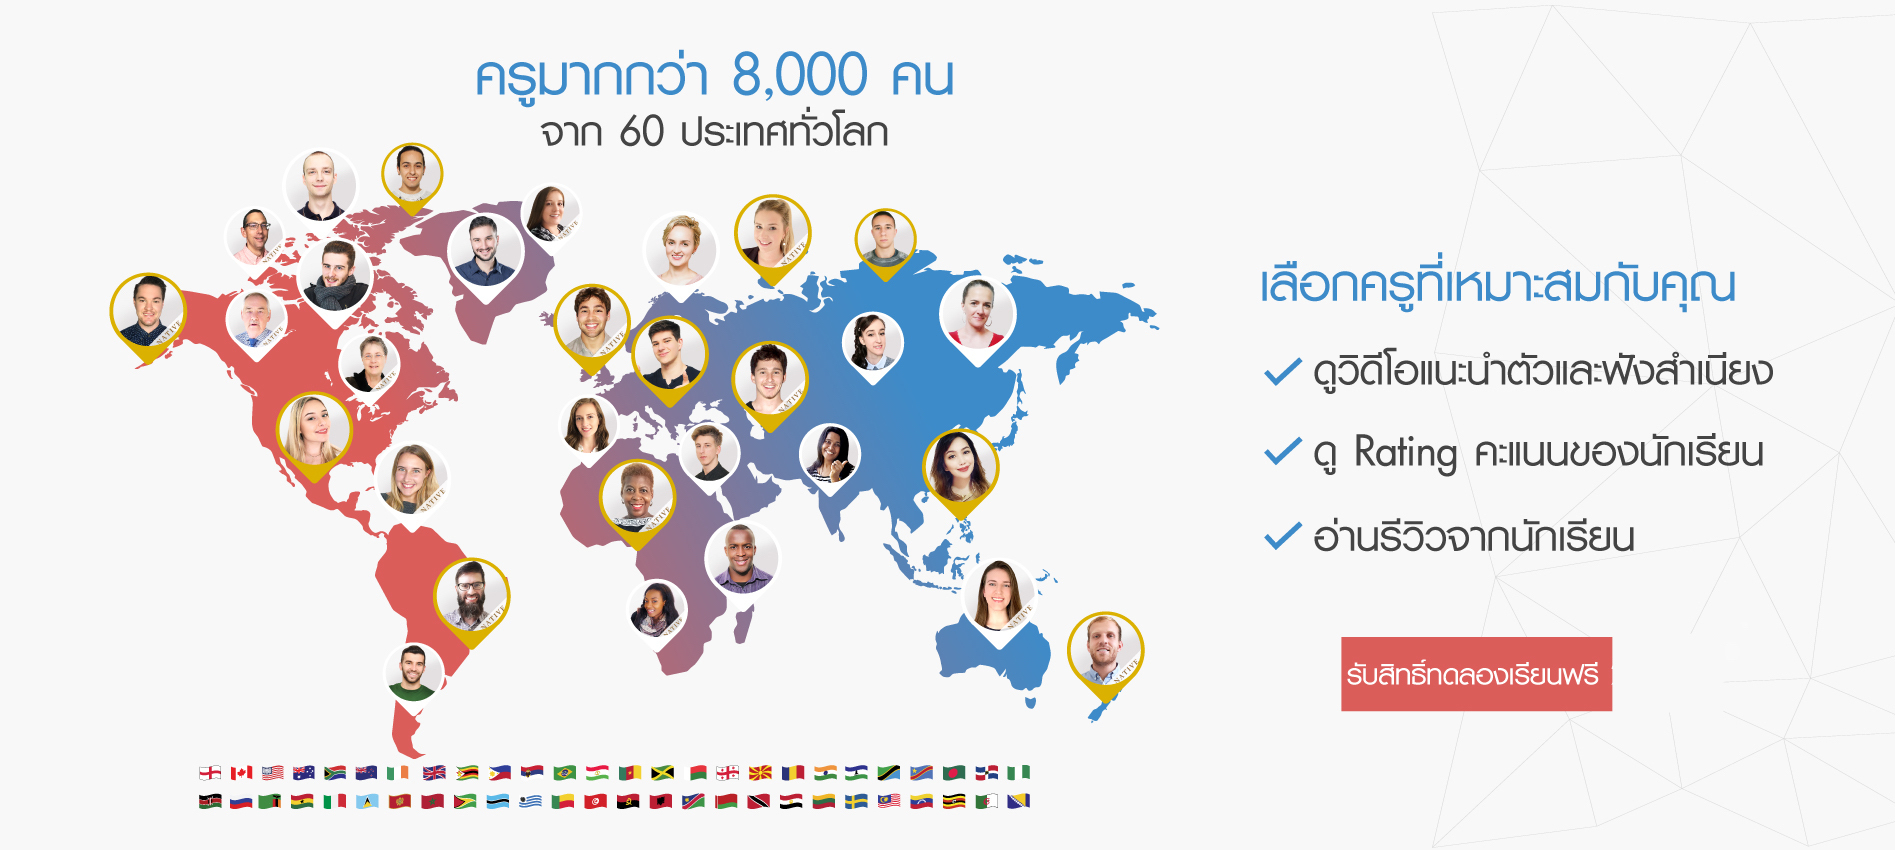 Thailand_size_engoo_banner_3